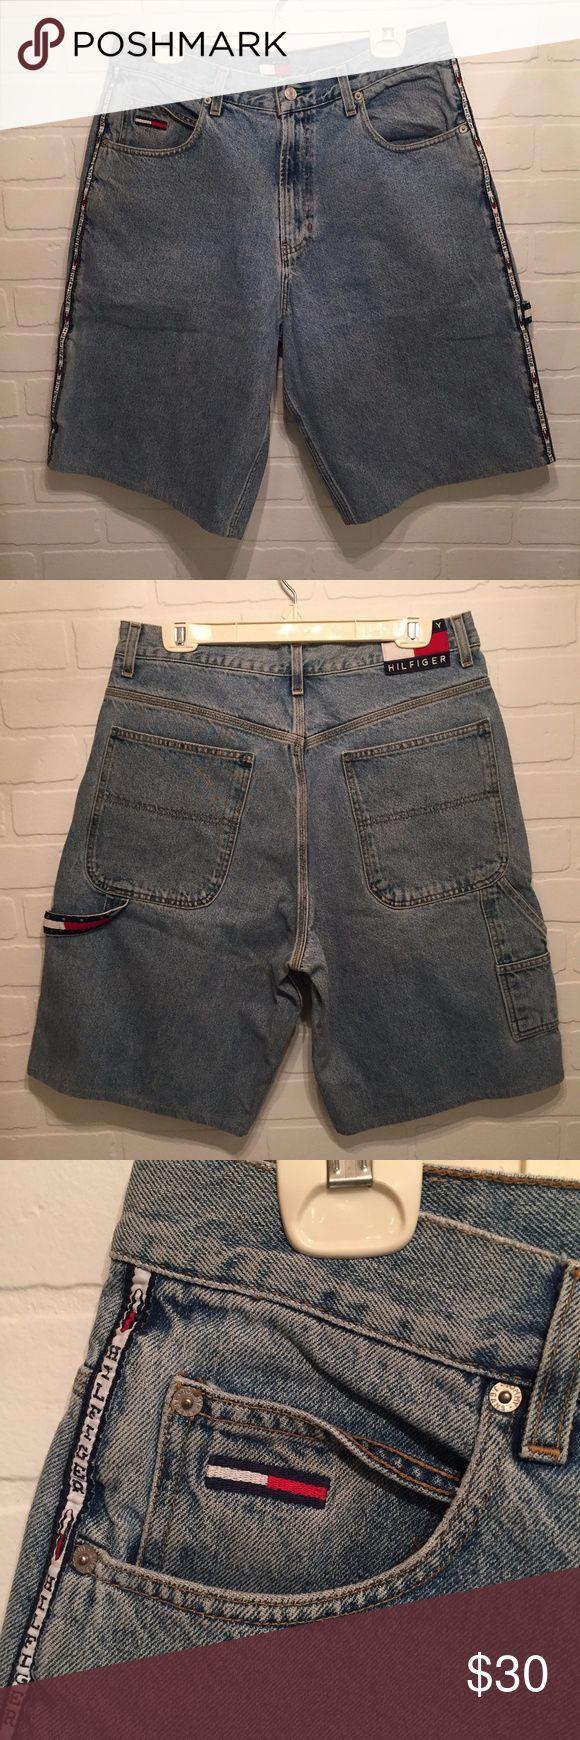 I just added this listing on Poshmark: Vintage Tommy Hilfiger Jean Shorts Mens Size 33. #shopmycloset #poshmark #fashion #shopping #style #forsale #Tommy Hilfiger #Other